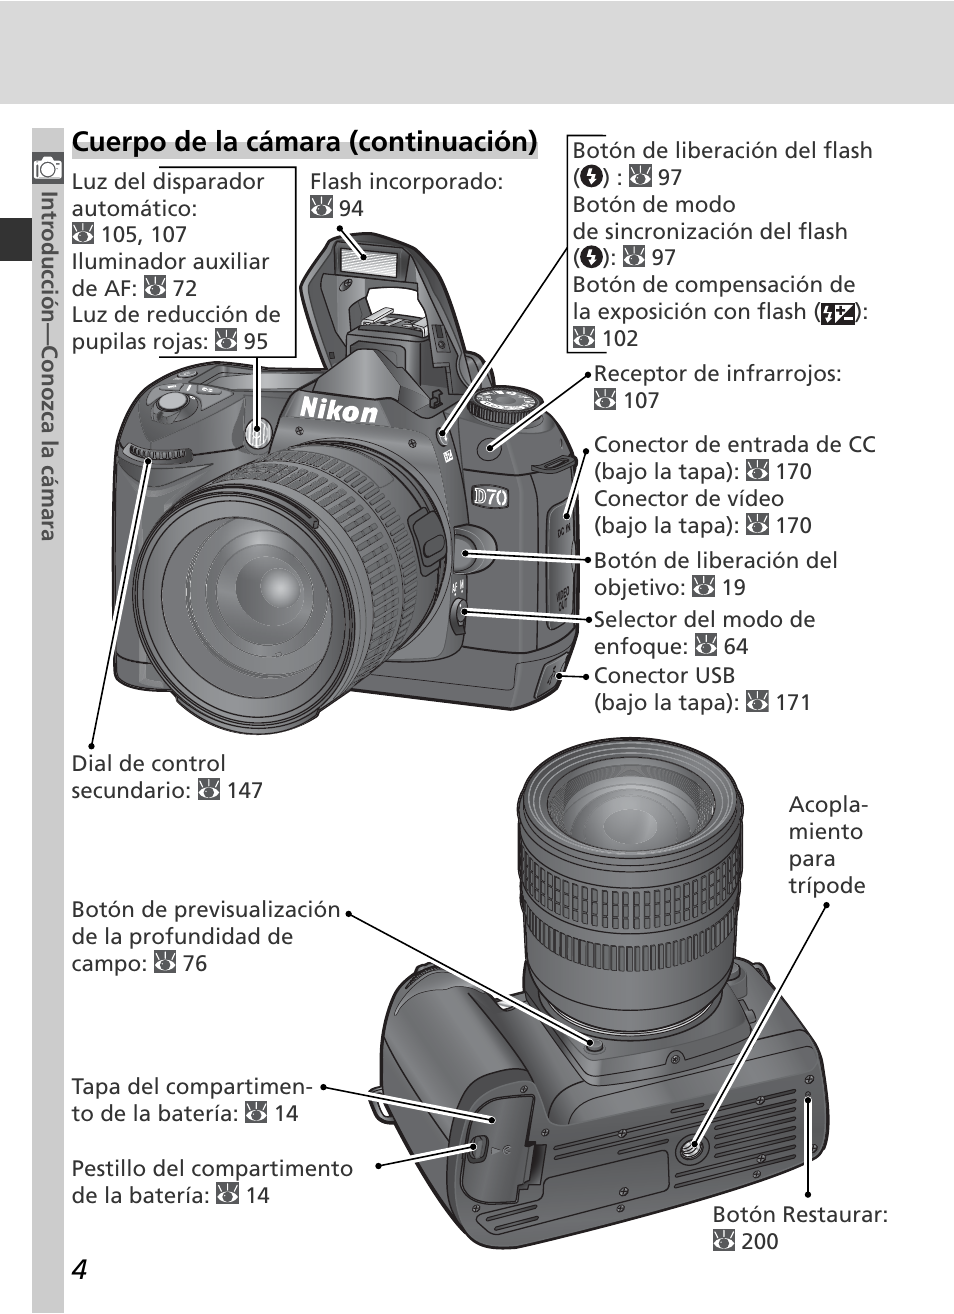 nikon d70 guide various owner manual guide u2022 rh justk co nikon d70 guide to digital photography nikon d70 manual español